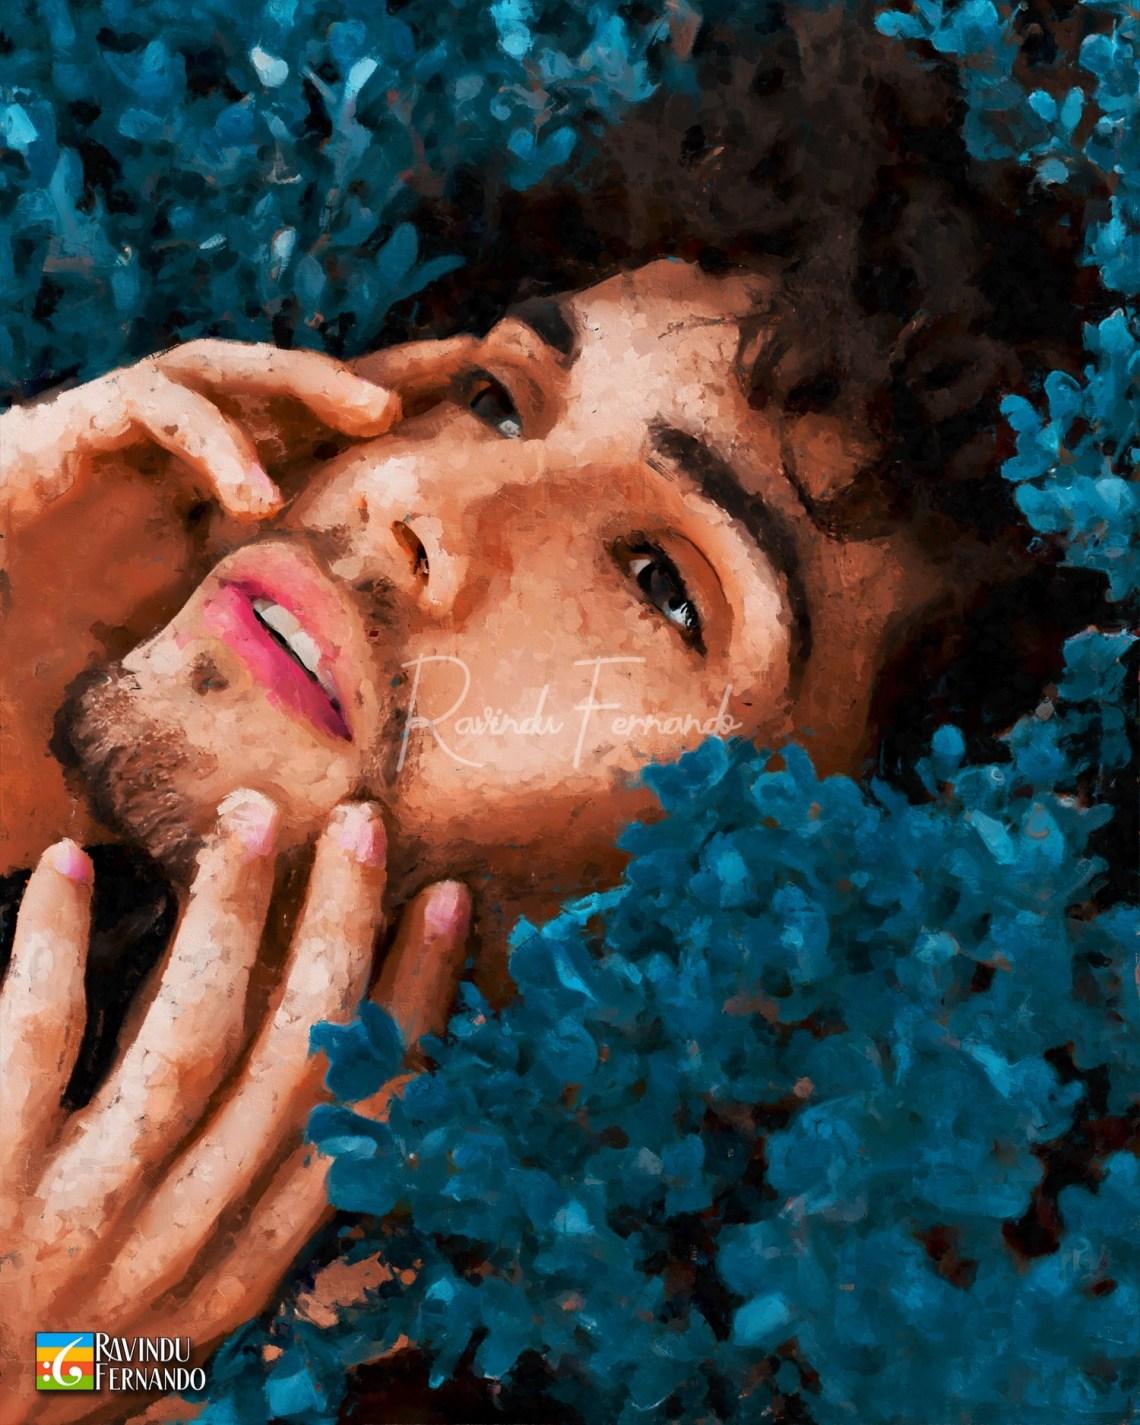 Boy with blue leves - Digital Oil Painting By Ravindu Fernando